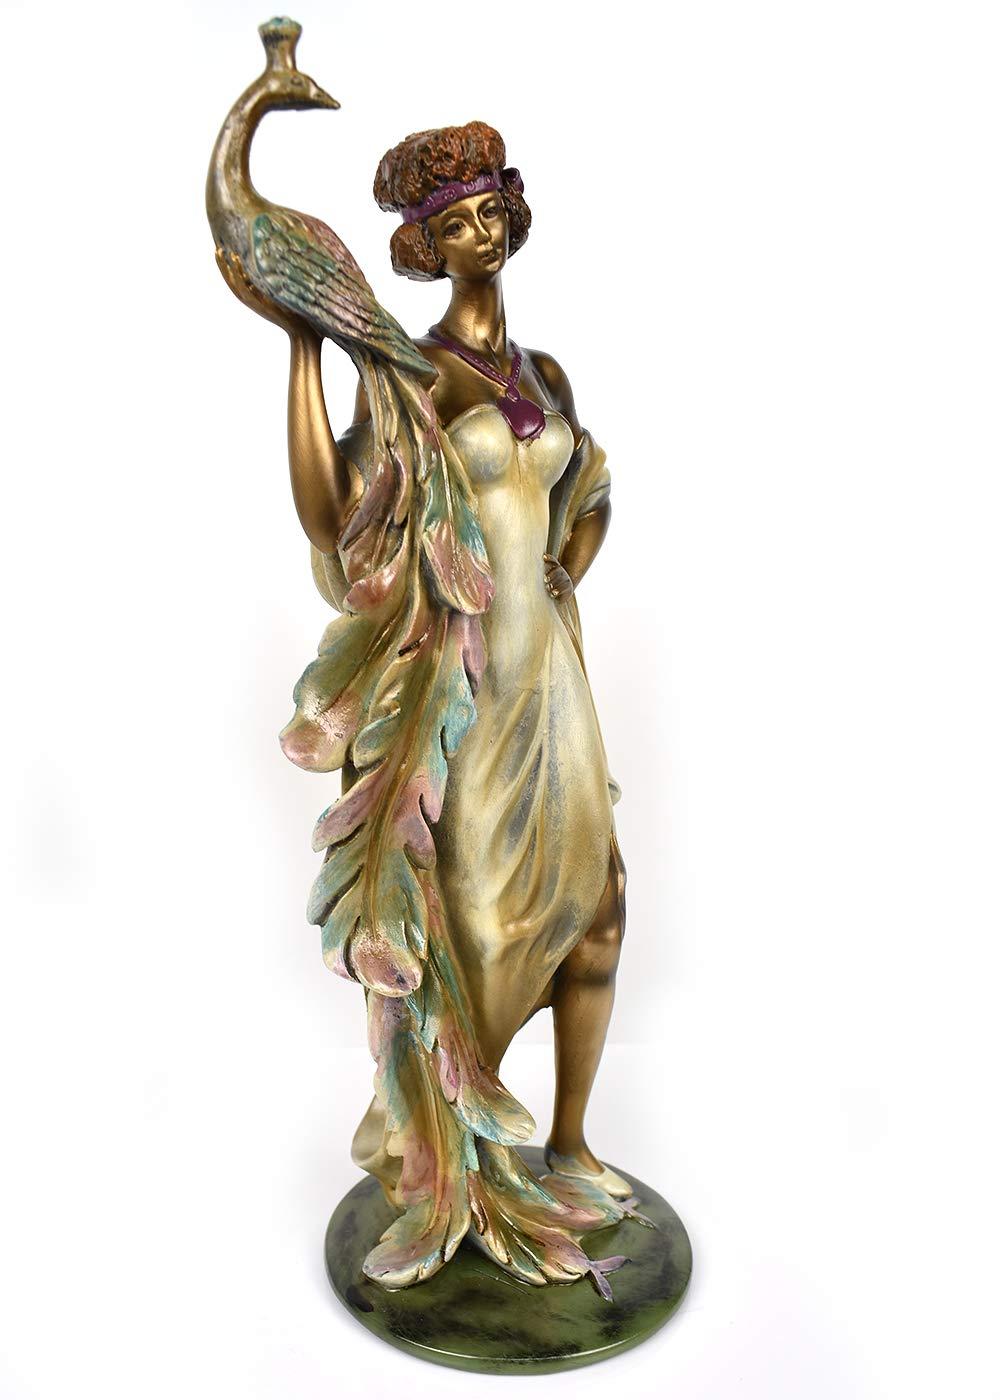 Ebros Aged Bronze Resin Nude Seductive Mermaid Statue 7.25 Tall Nautical Coastal Ocean Sea Decor Figurine Sirens Luring Maidens of The Dark Waters Fantasy Sculpture Ebros Gift